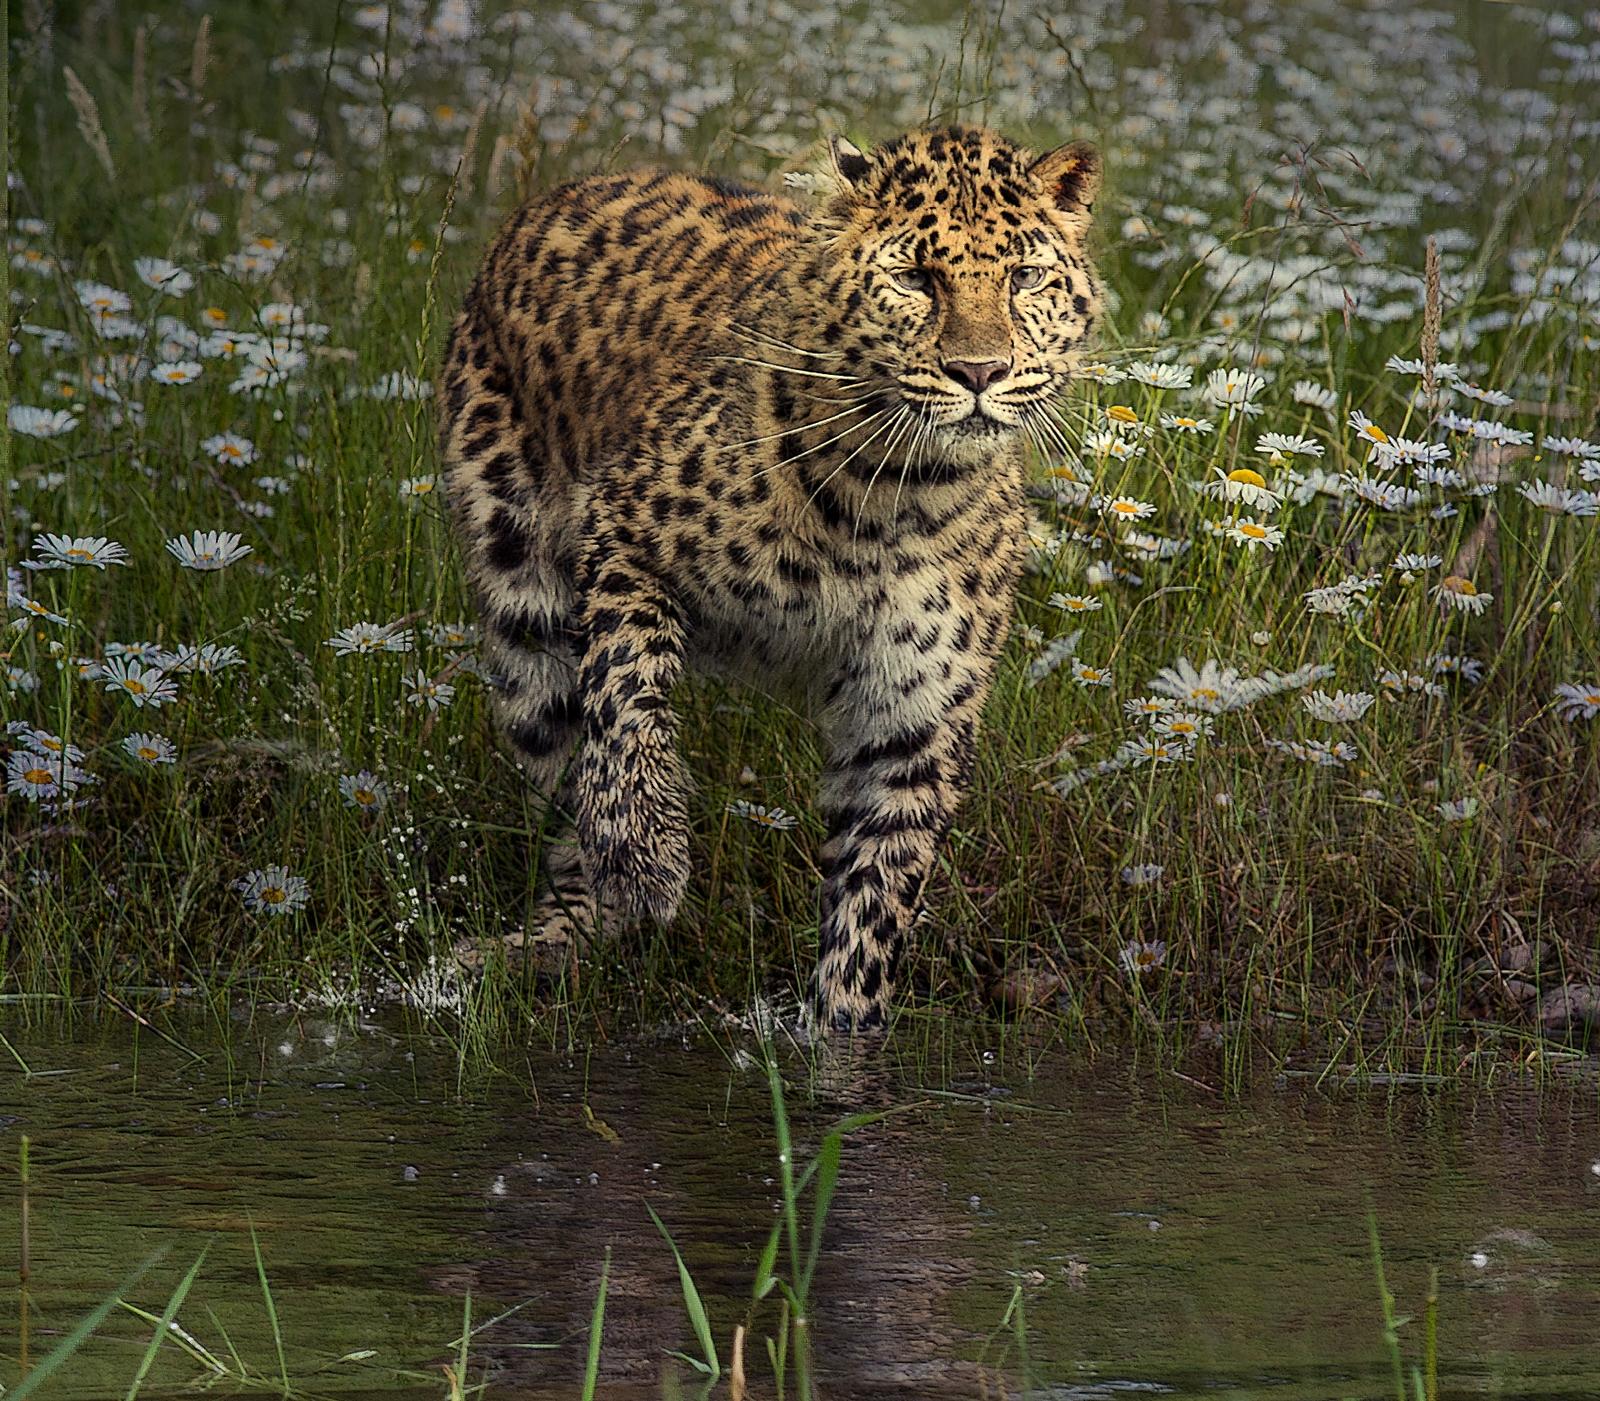 Amur Leopard in Daisies